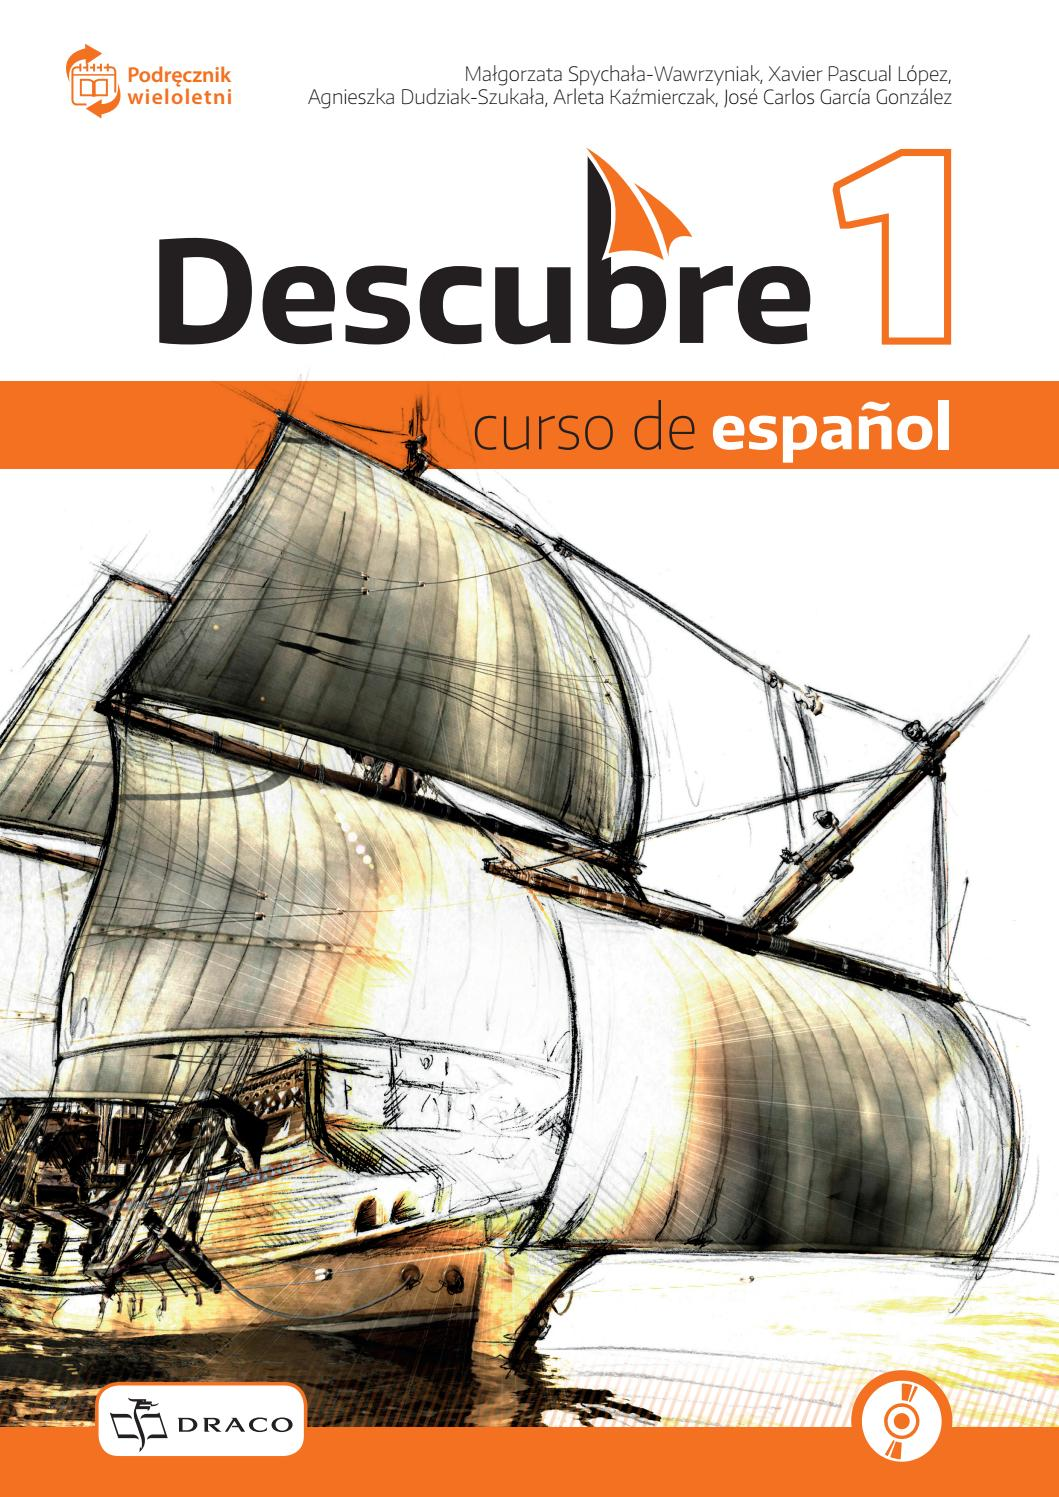 Descubre 1 Npp By Wydawnictwodraco Issuu